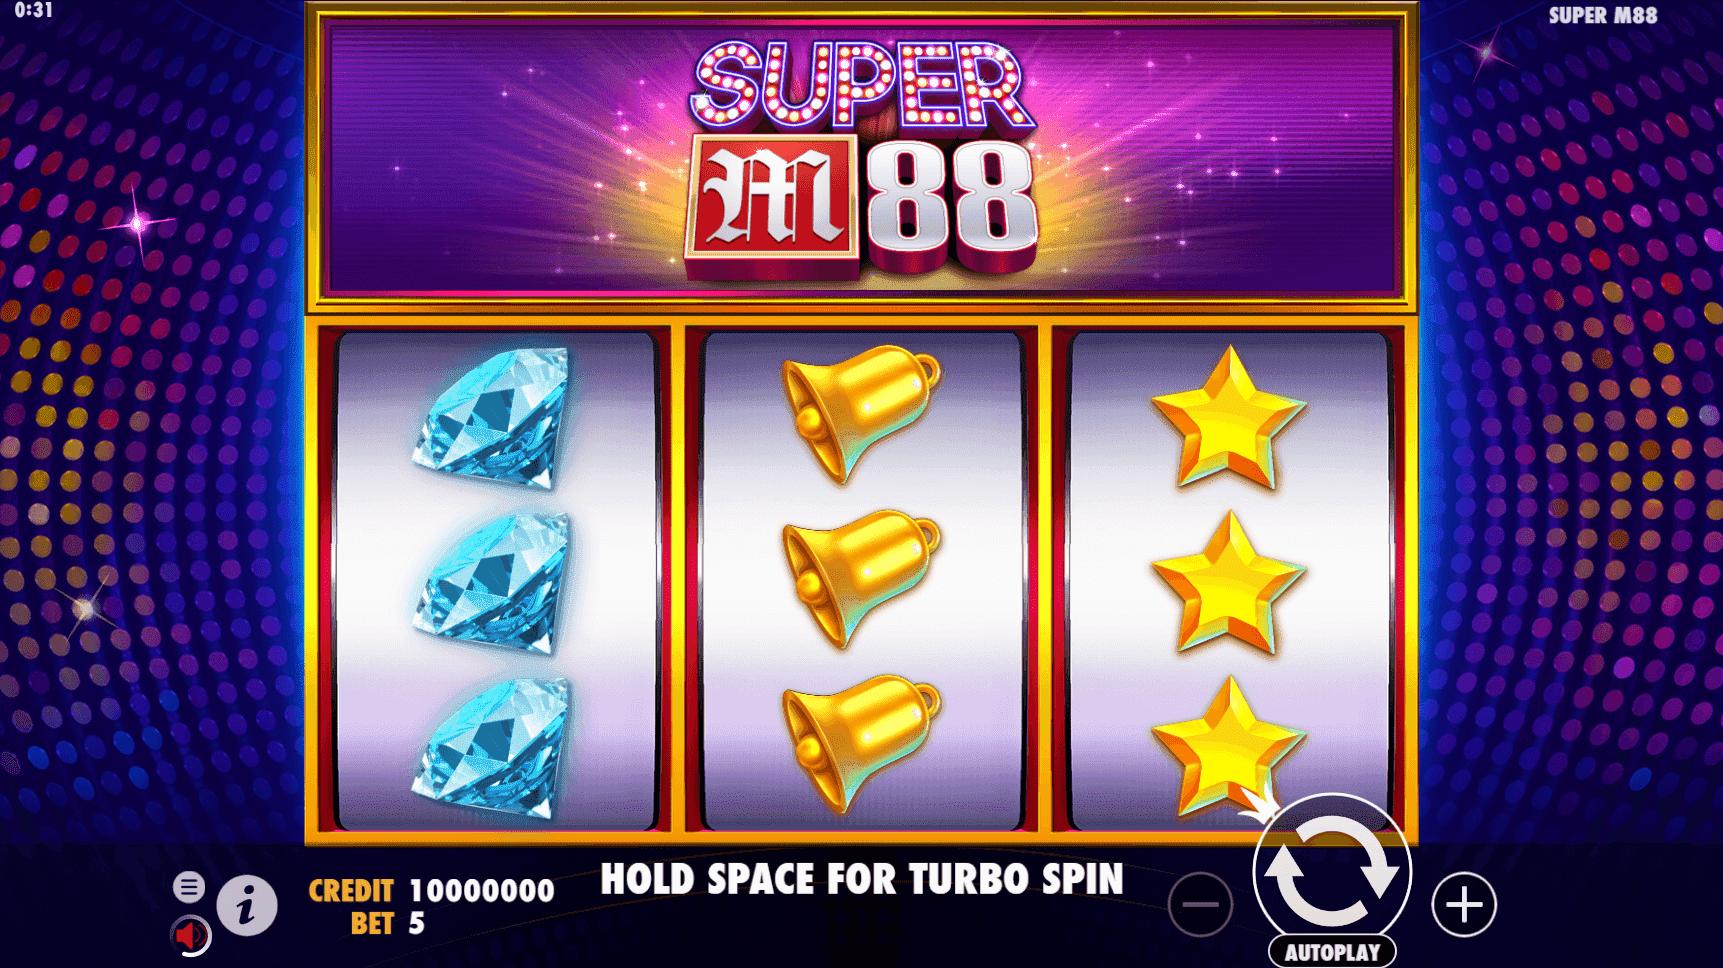 Super M88 slot machine screenshot